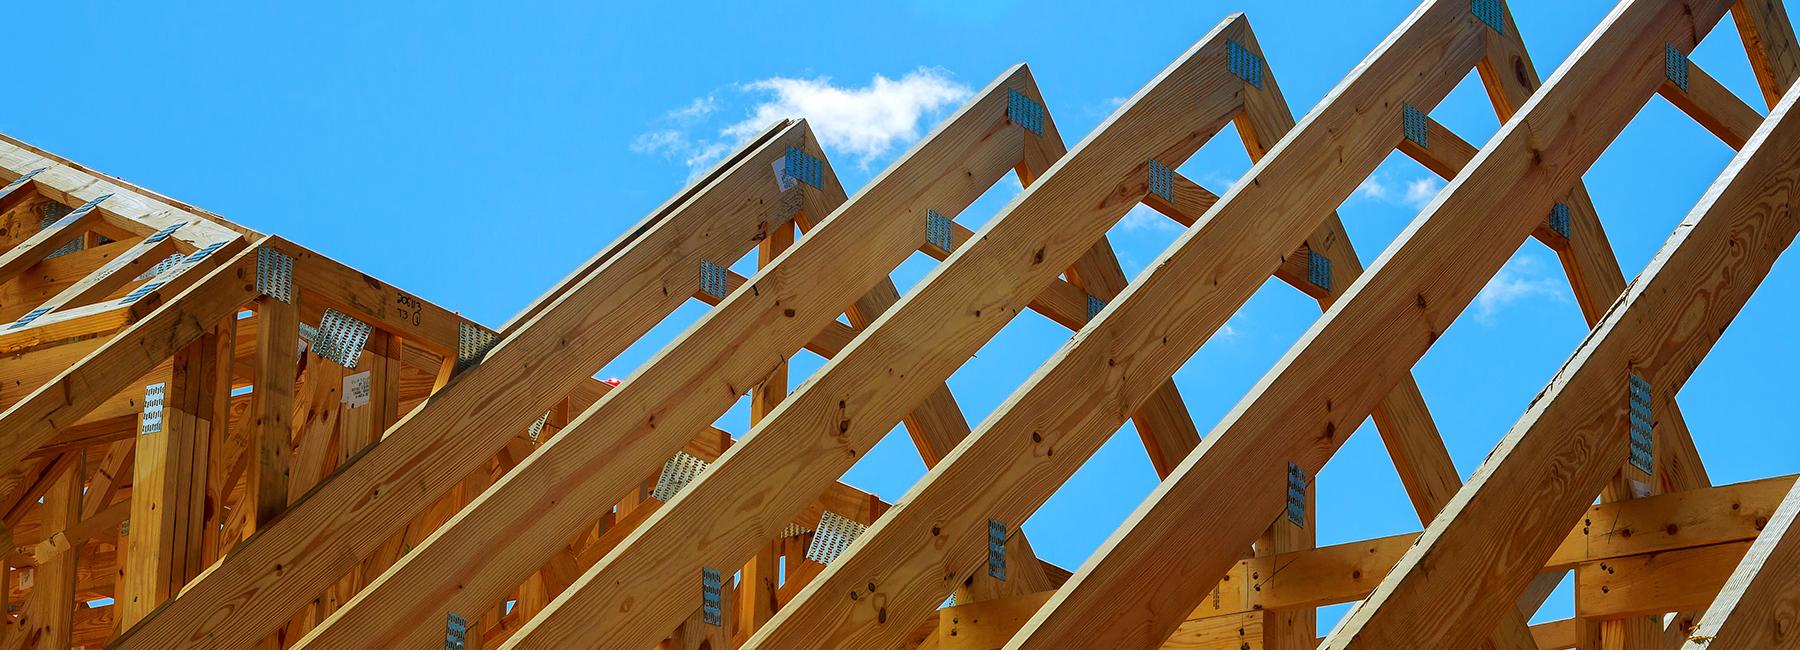 Myrtle Beach Construction Company